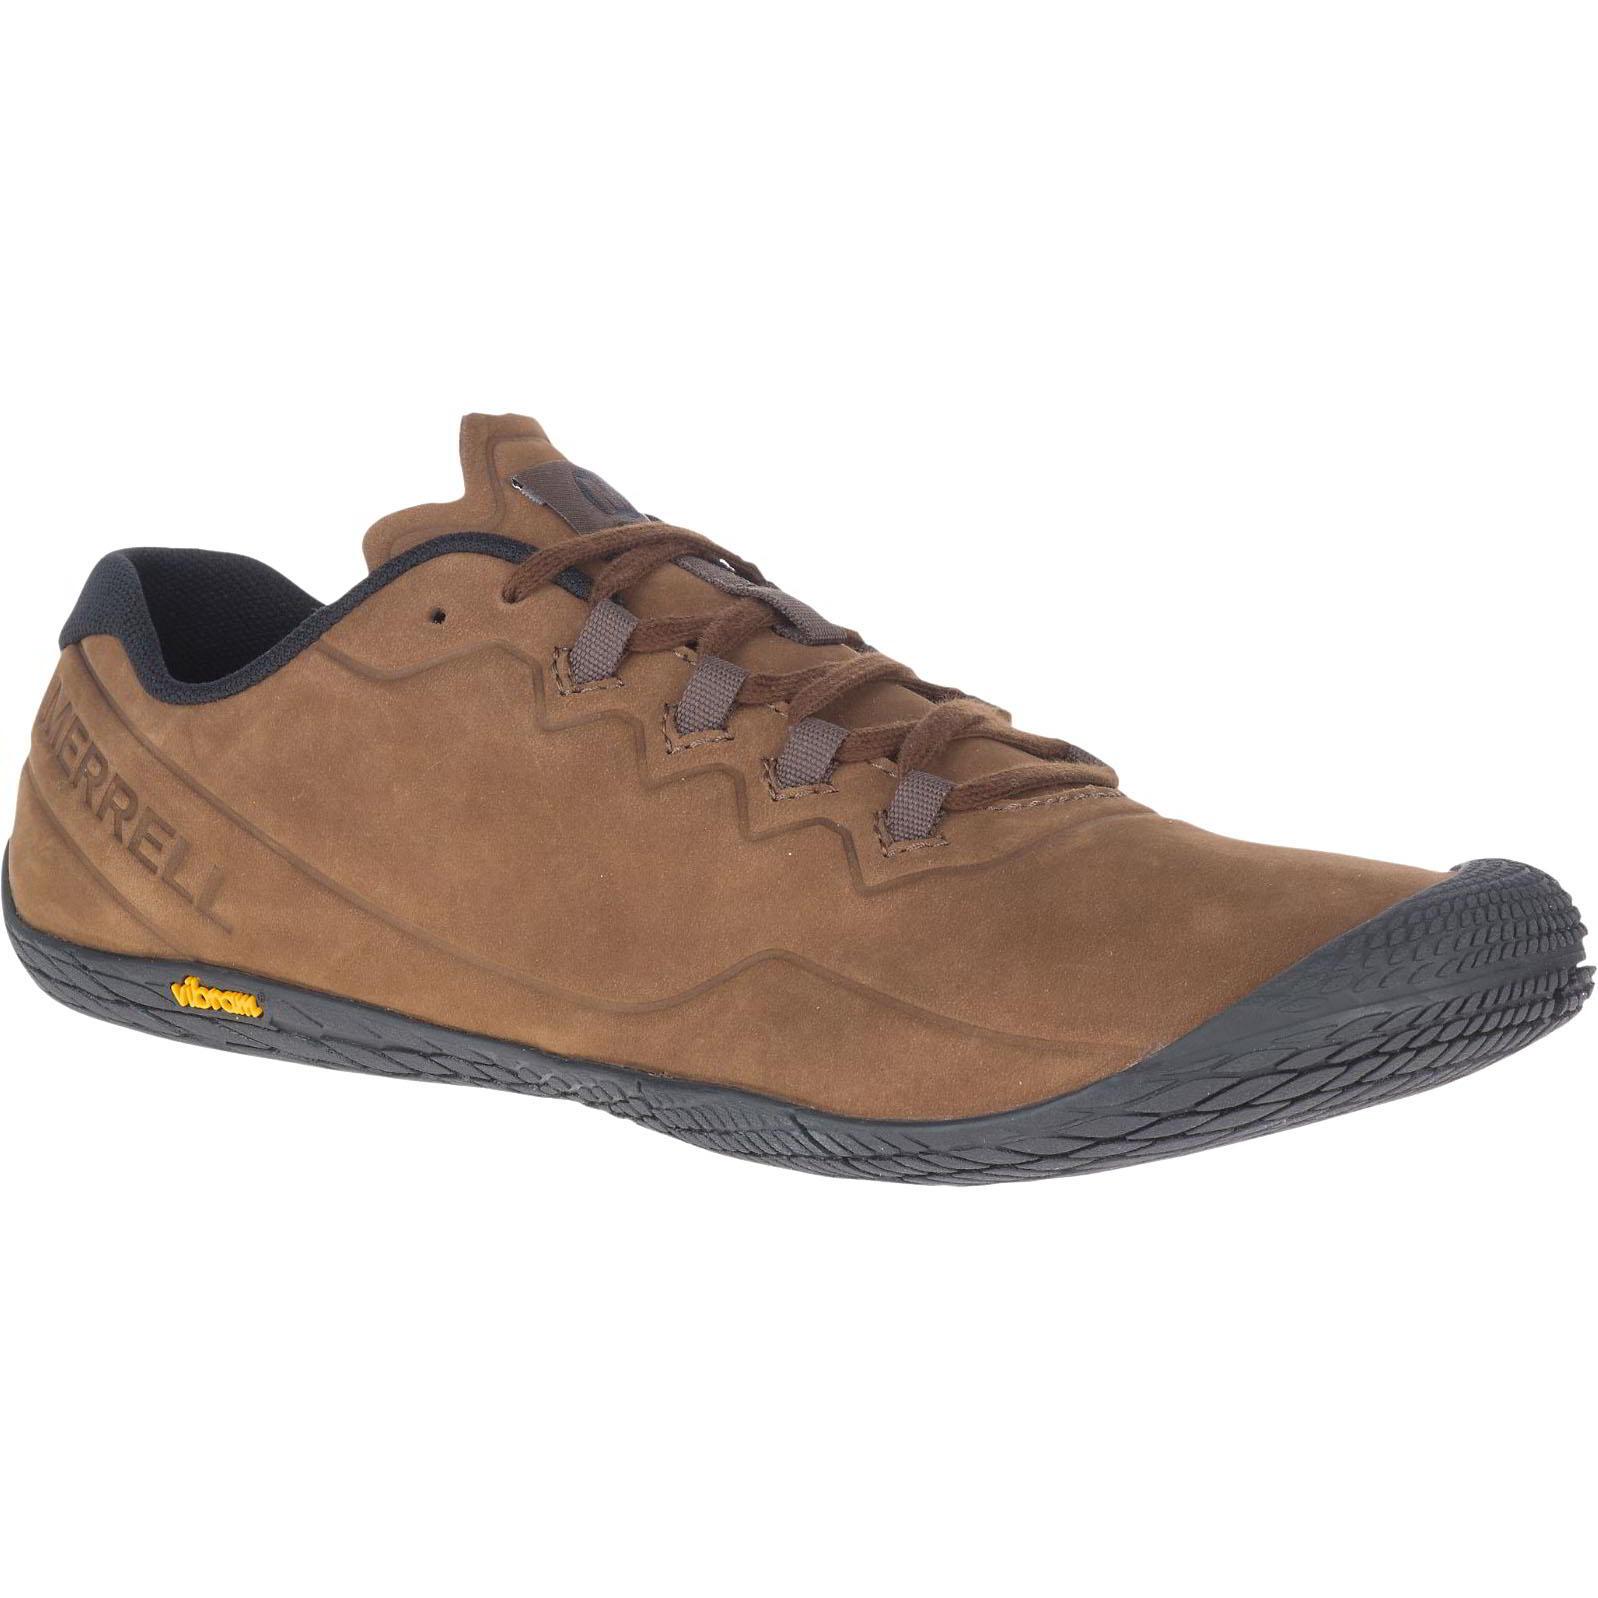 Merrell Mens Vapor Glove 3 Luna Ltr Leather Barefoot Shoes - Earth